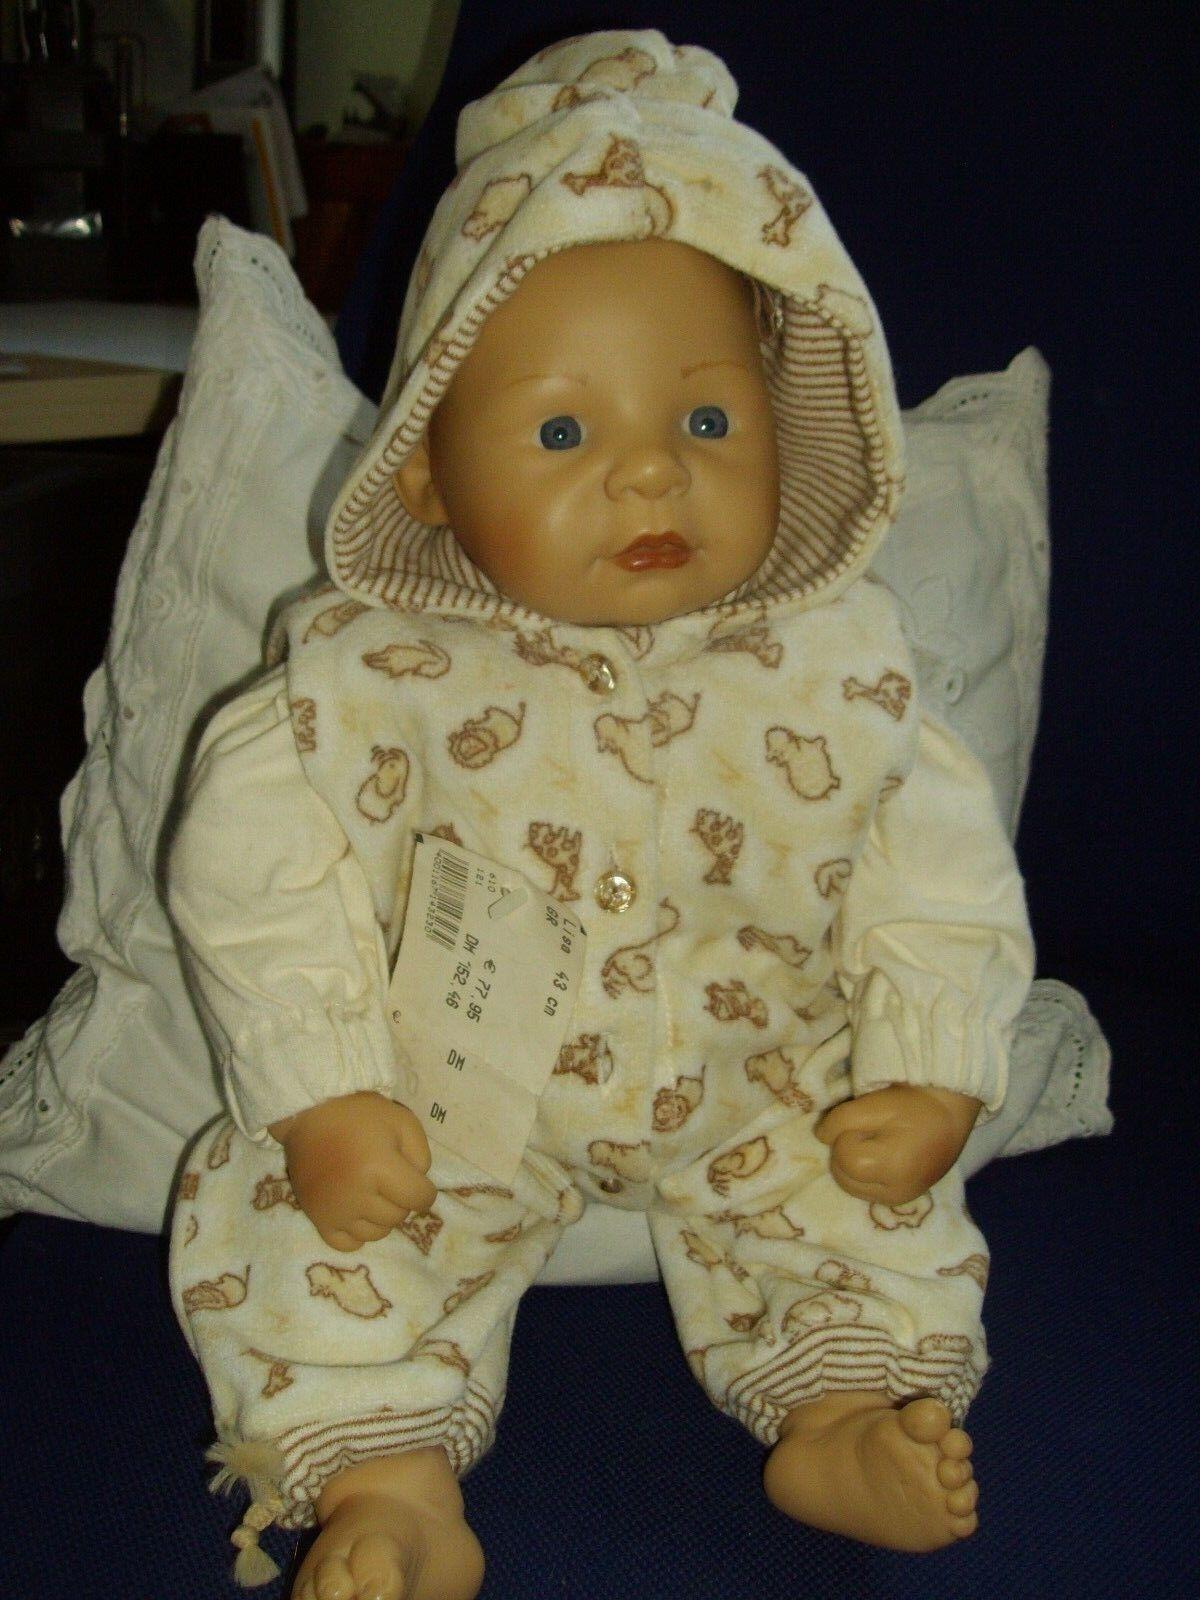 Lisa - Zapf Colette Puppe 43 cm Babypuppe 1998 Sammlerpuppe Sammlerpuppe Sammlerpuppe Spielpuppe Doll 9e52fa